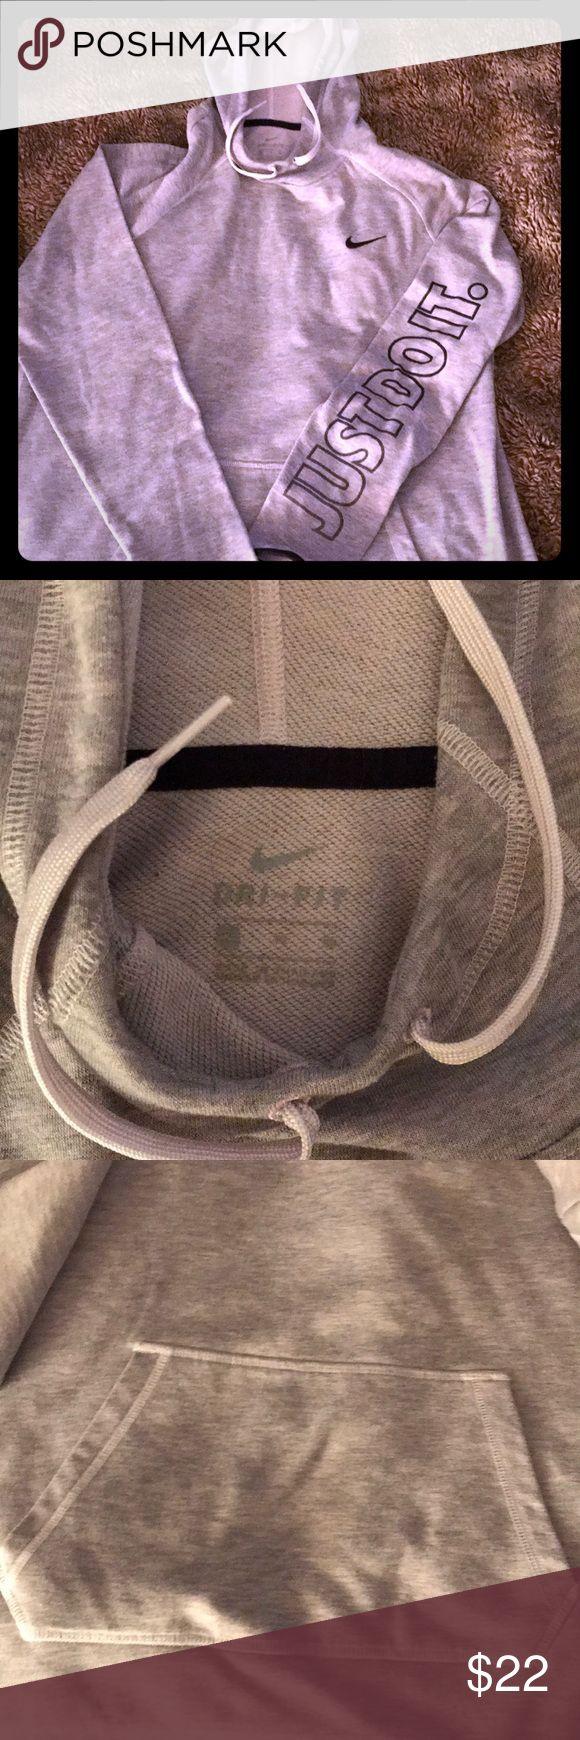 Nike grey women's Hoodie size L/XL EOC Size L/XL Grey with navy trim  Very comfy kangaroo pocket Nike Tops Sweatshirts & Hoodies